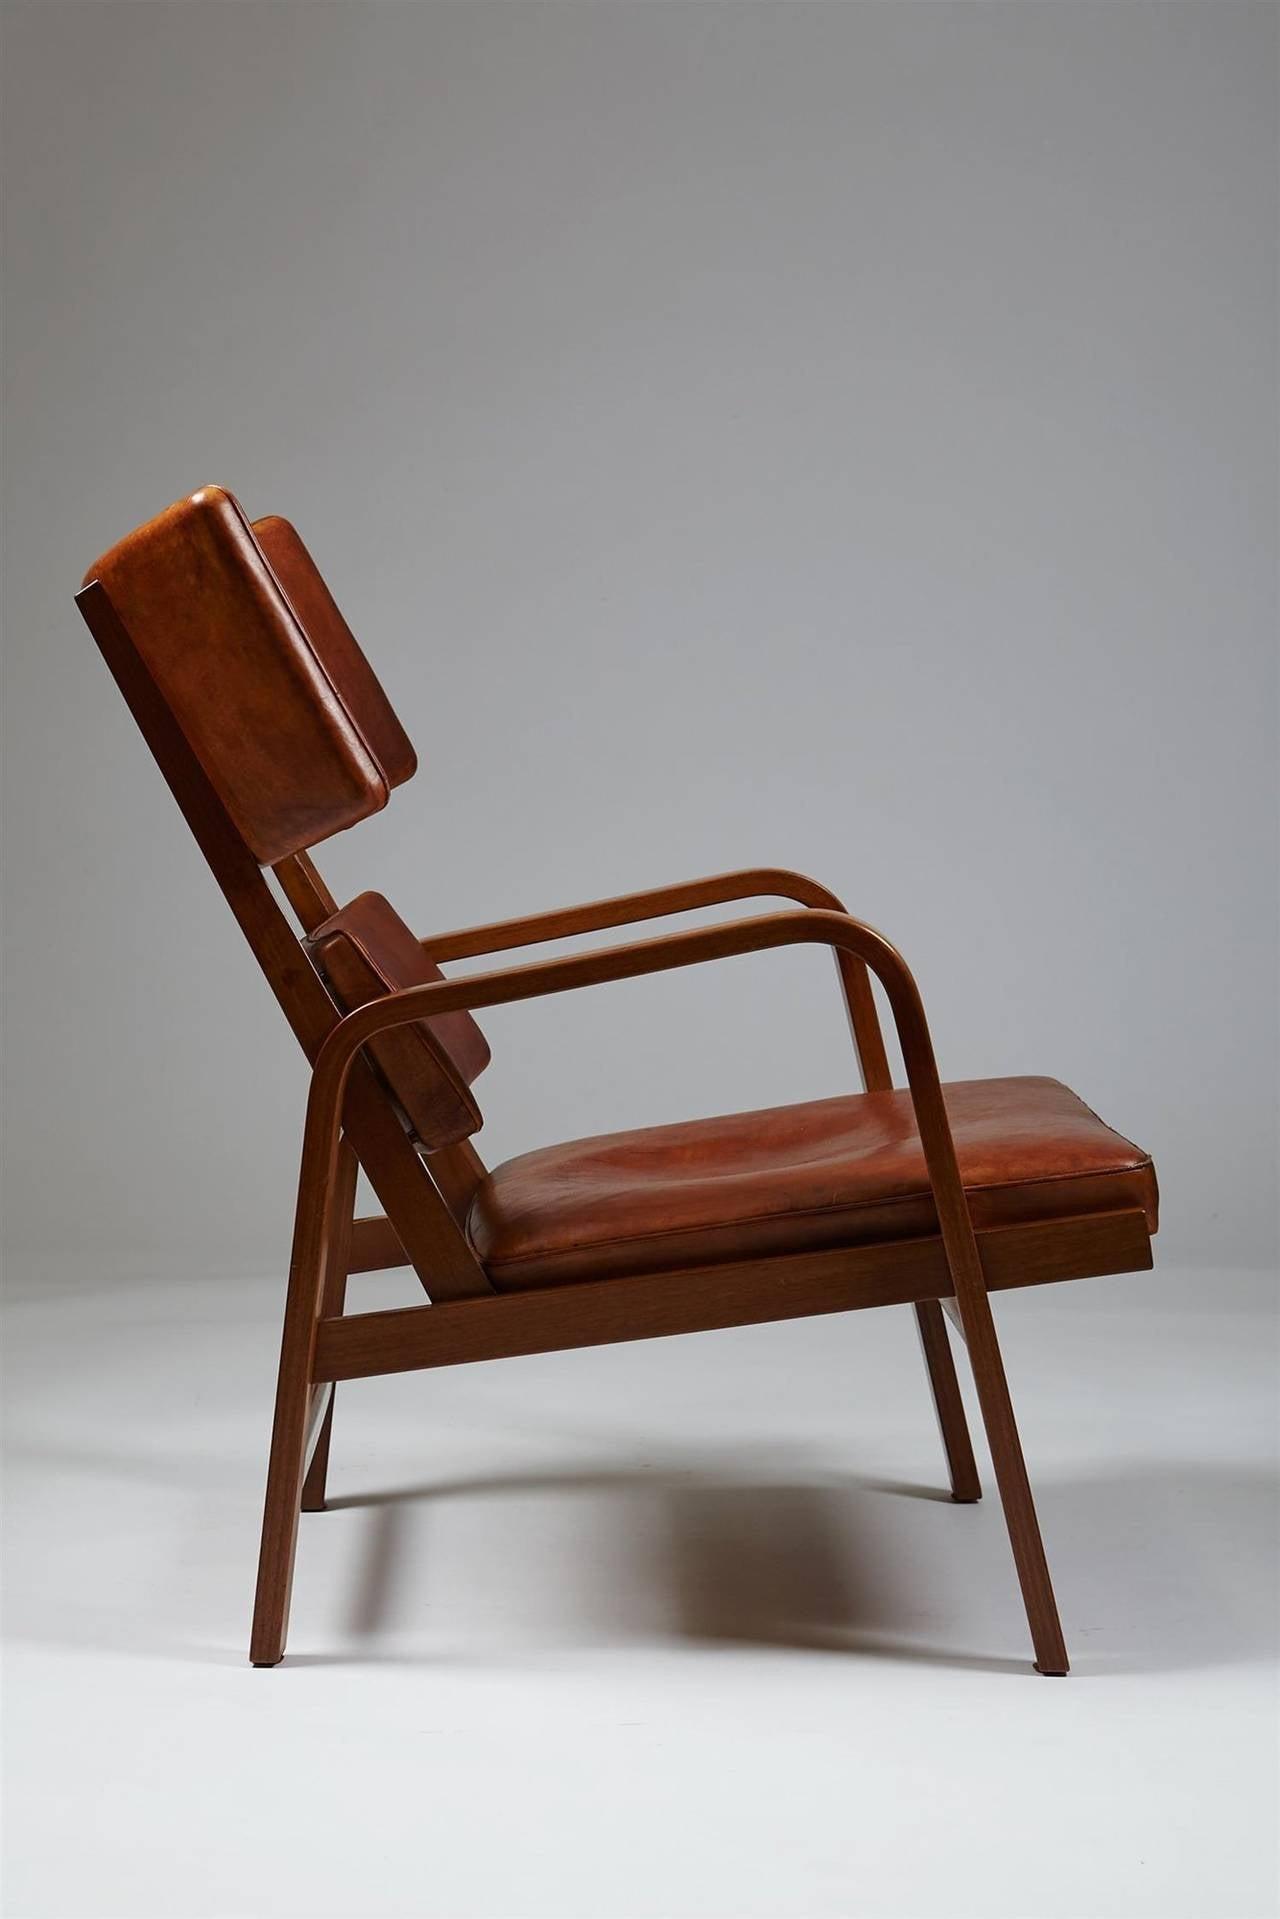 Armchairs Designed By Magnus Stephensen Denmark 1963 For